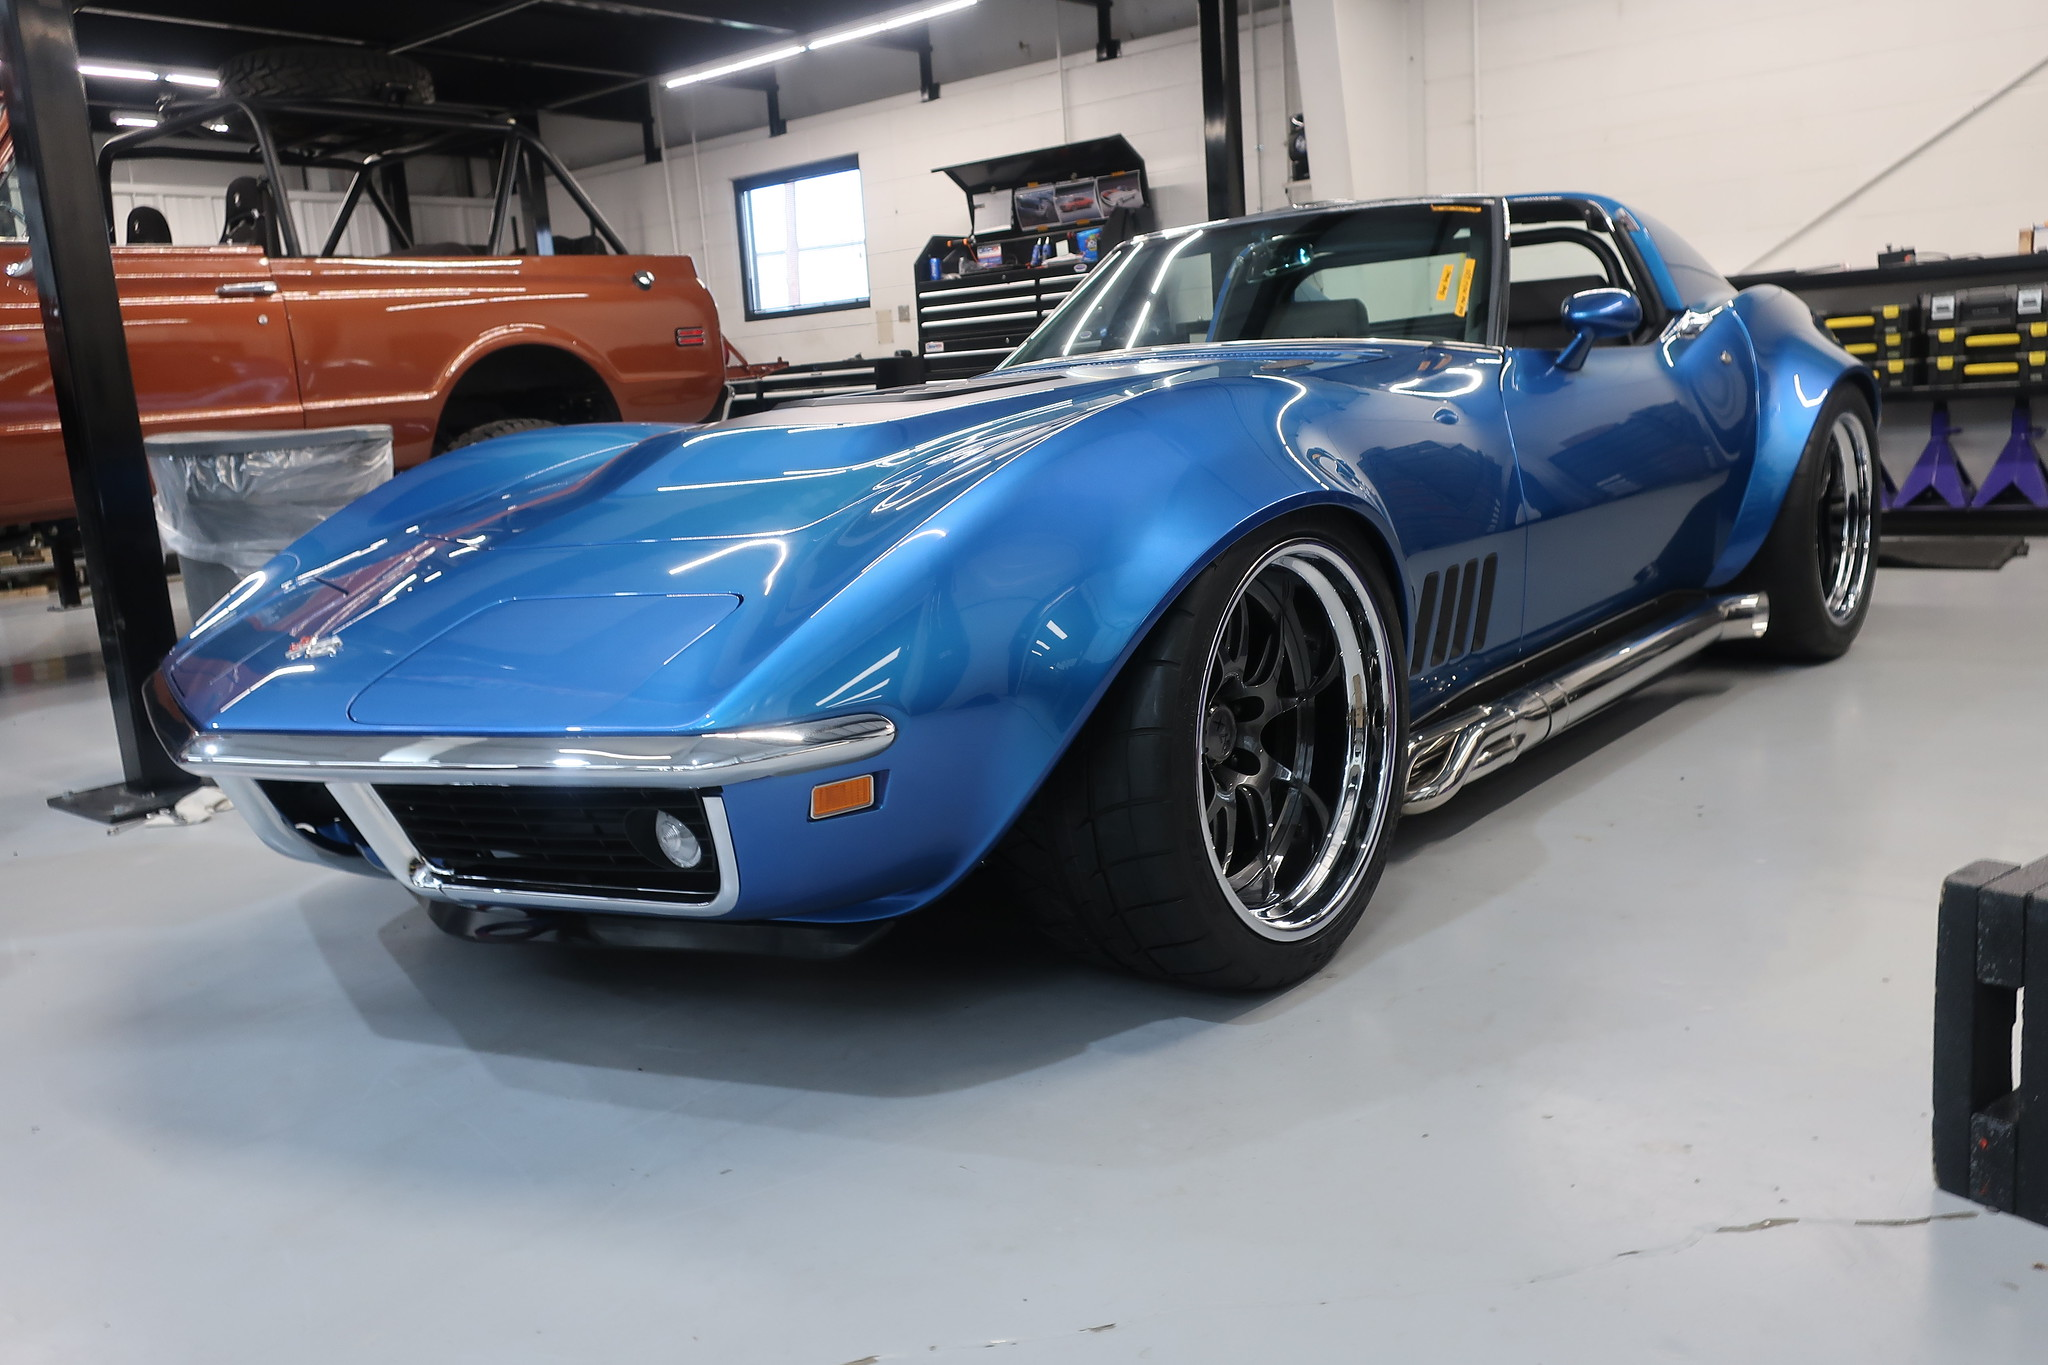 1969 Corvette with a LS7 V8